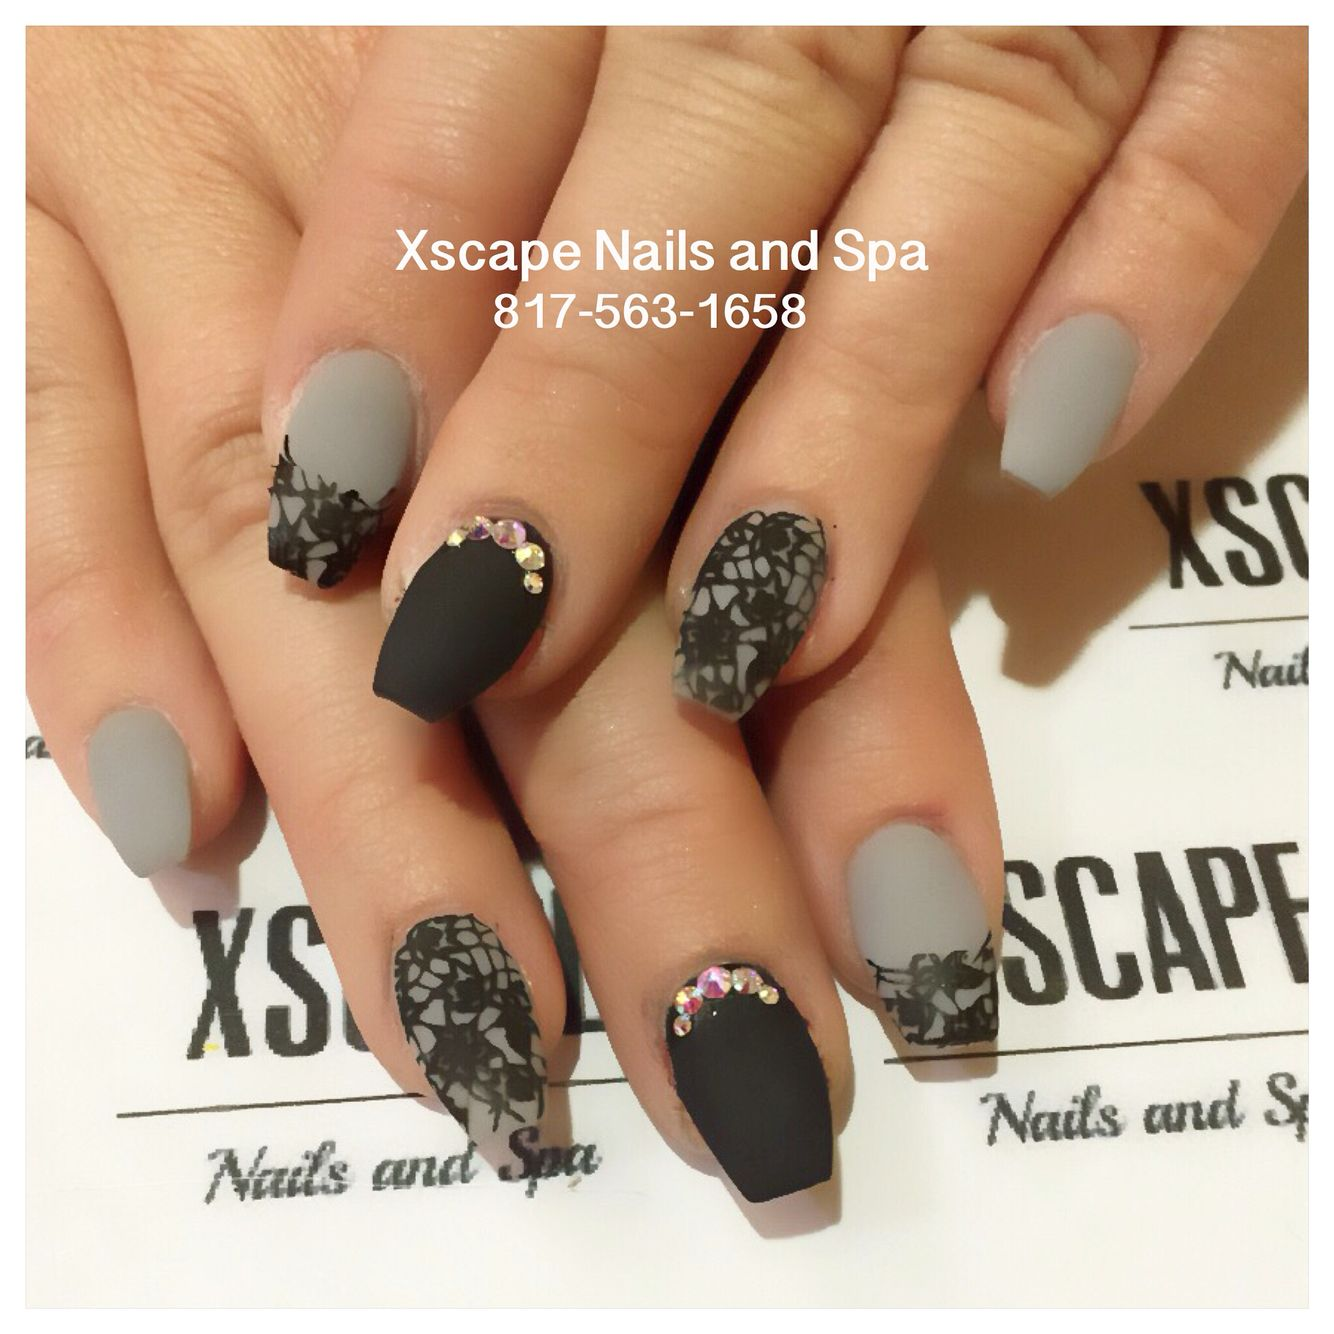 Matte lace nail designs - Matte Lace Nail Designs Cute Nails Designs Nails, Nail Designs